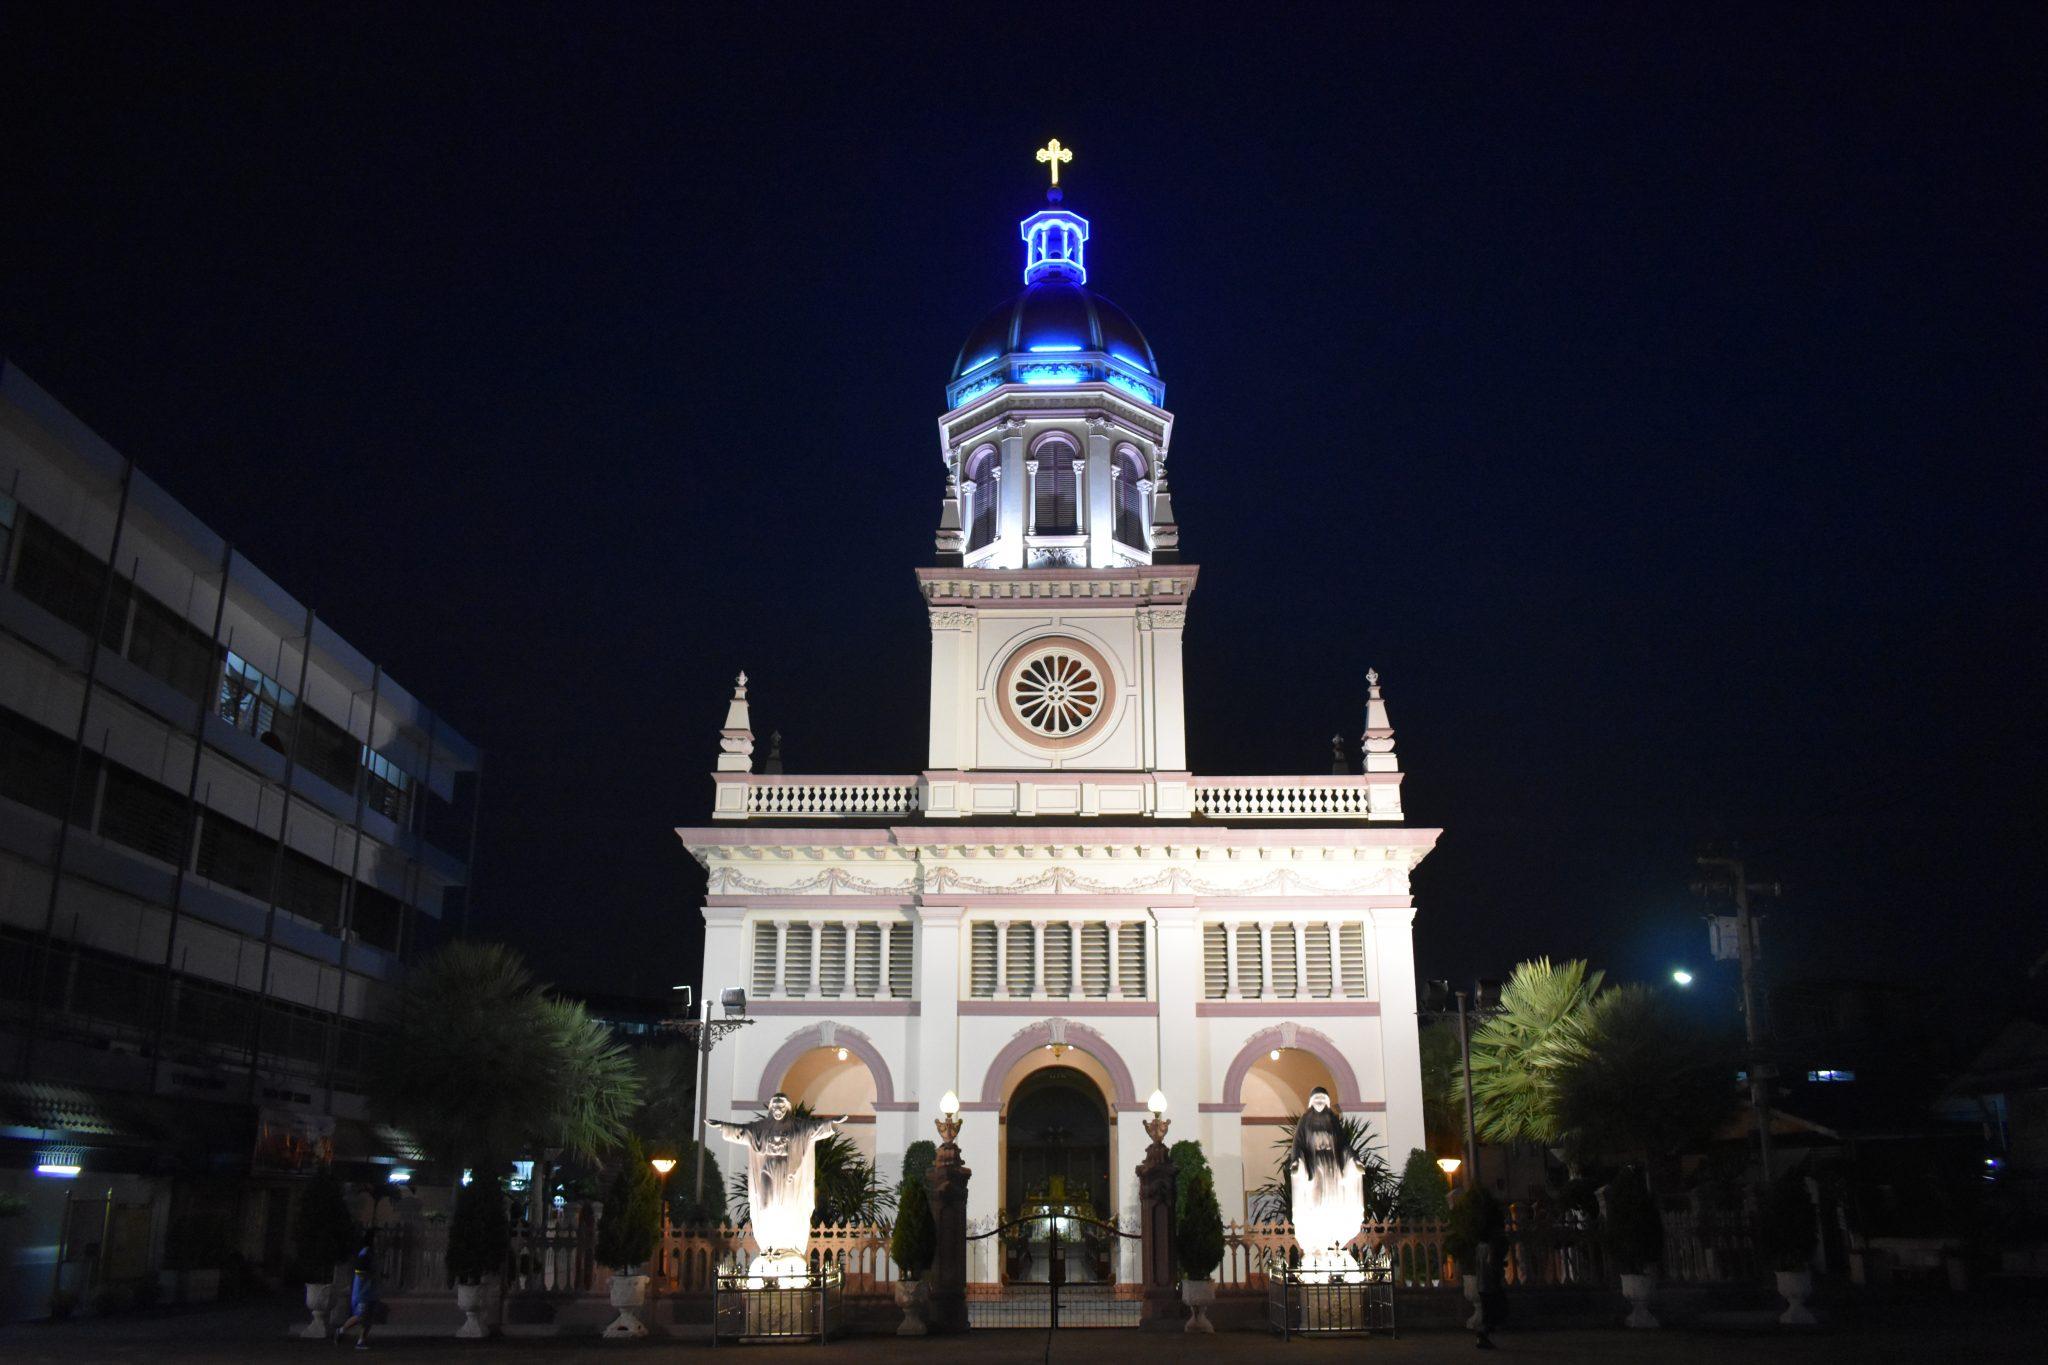 DSC 0738 - Santa Cruz Church